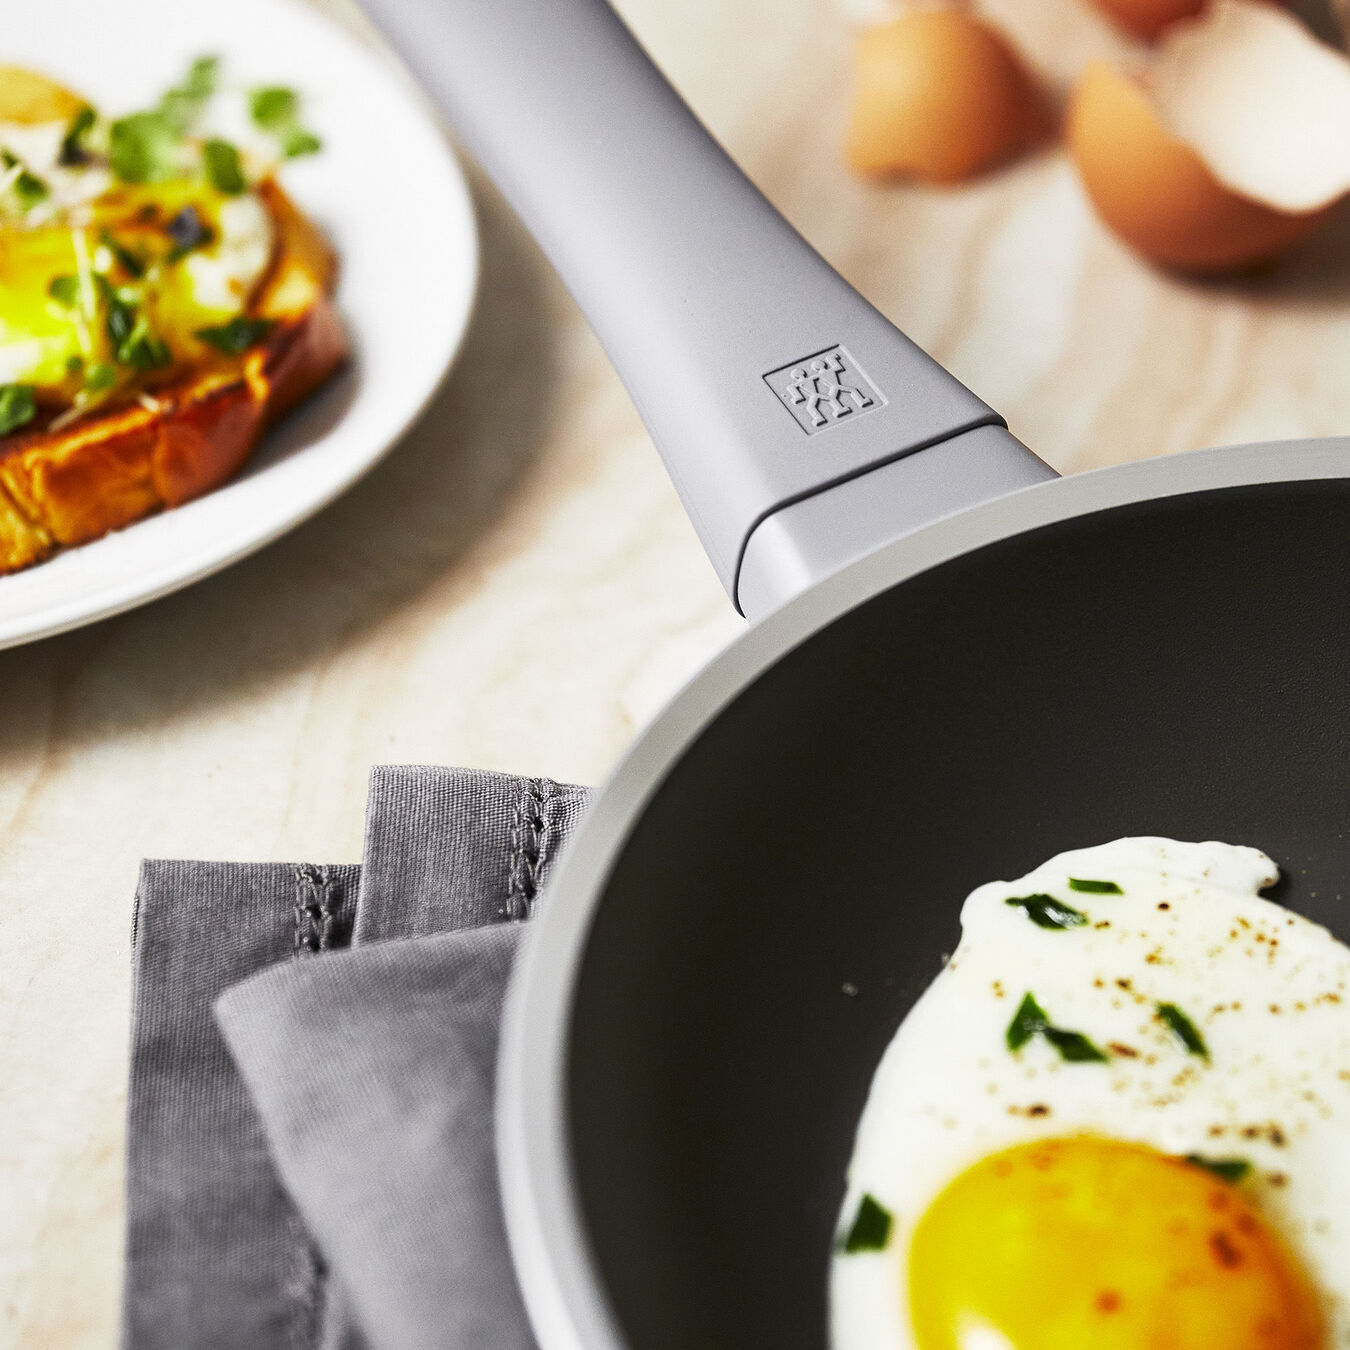 20 cm / 8 inch Frying pan,,large 7